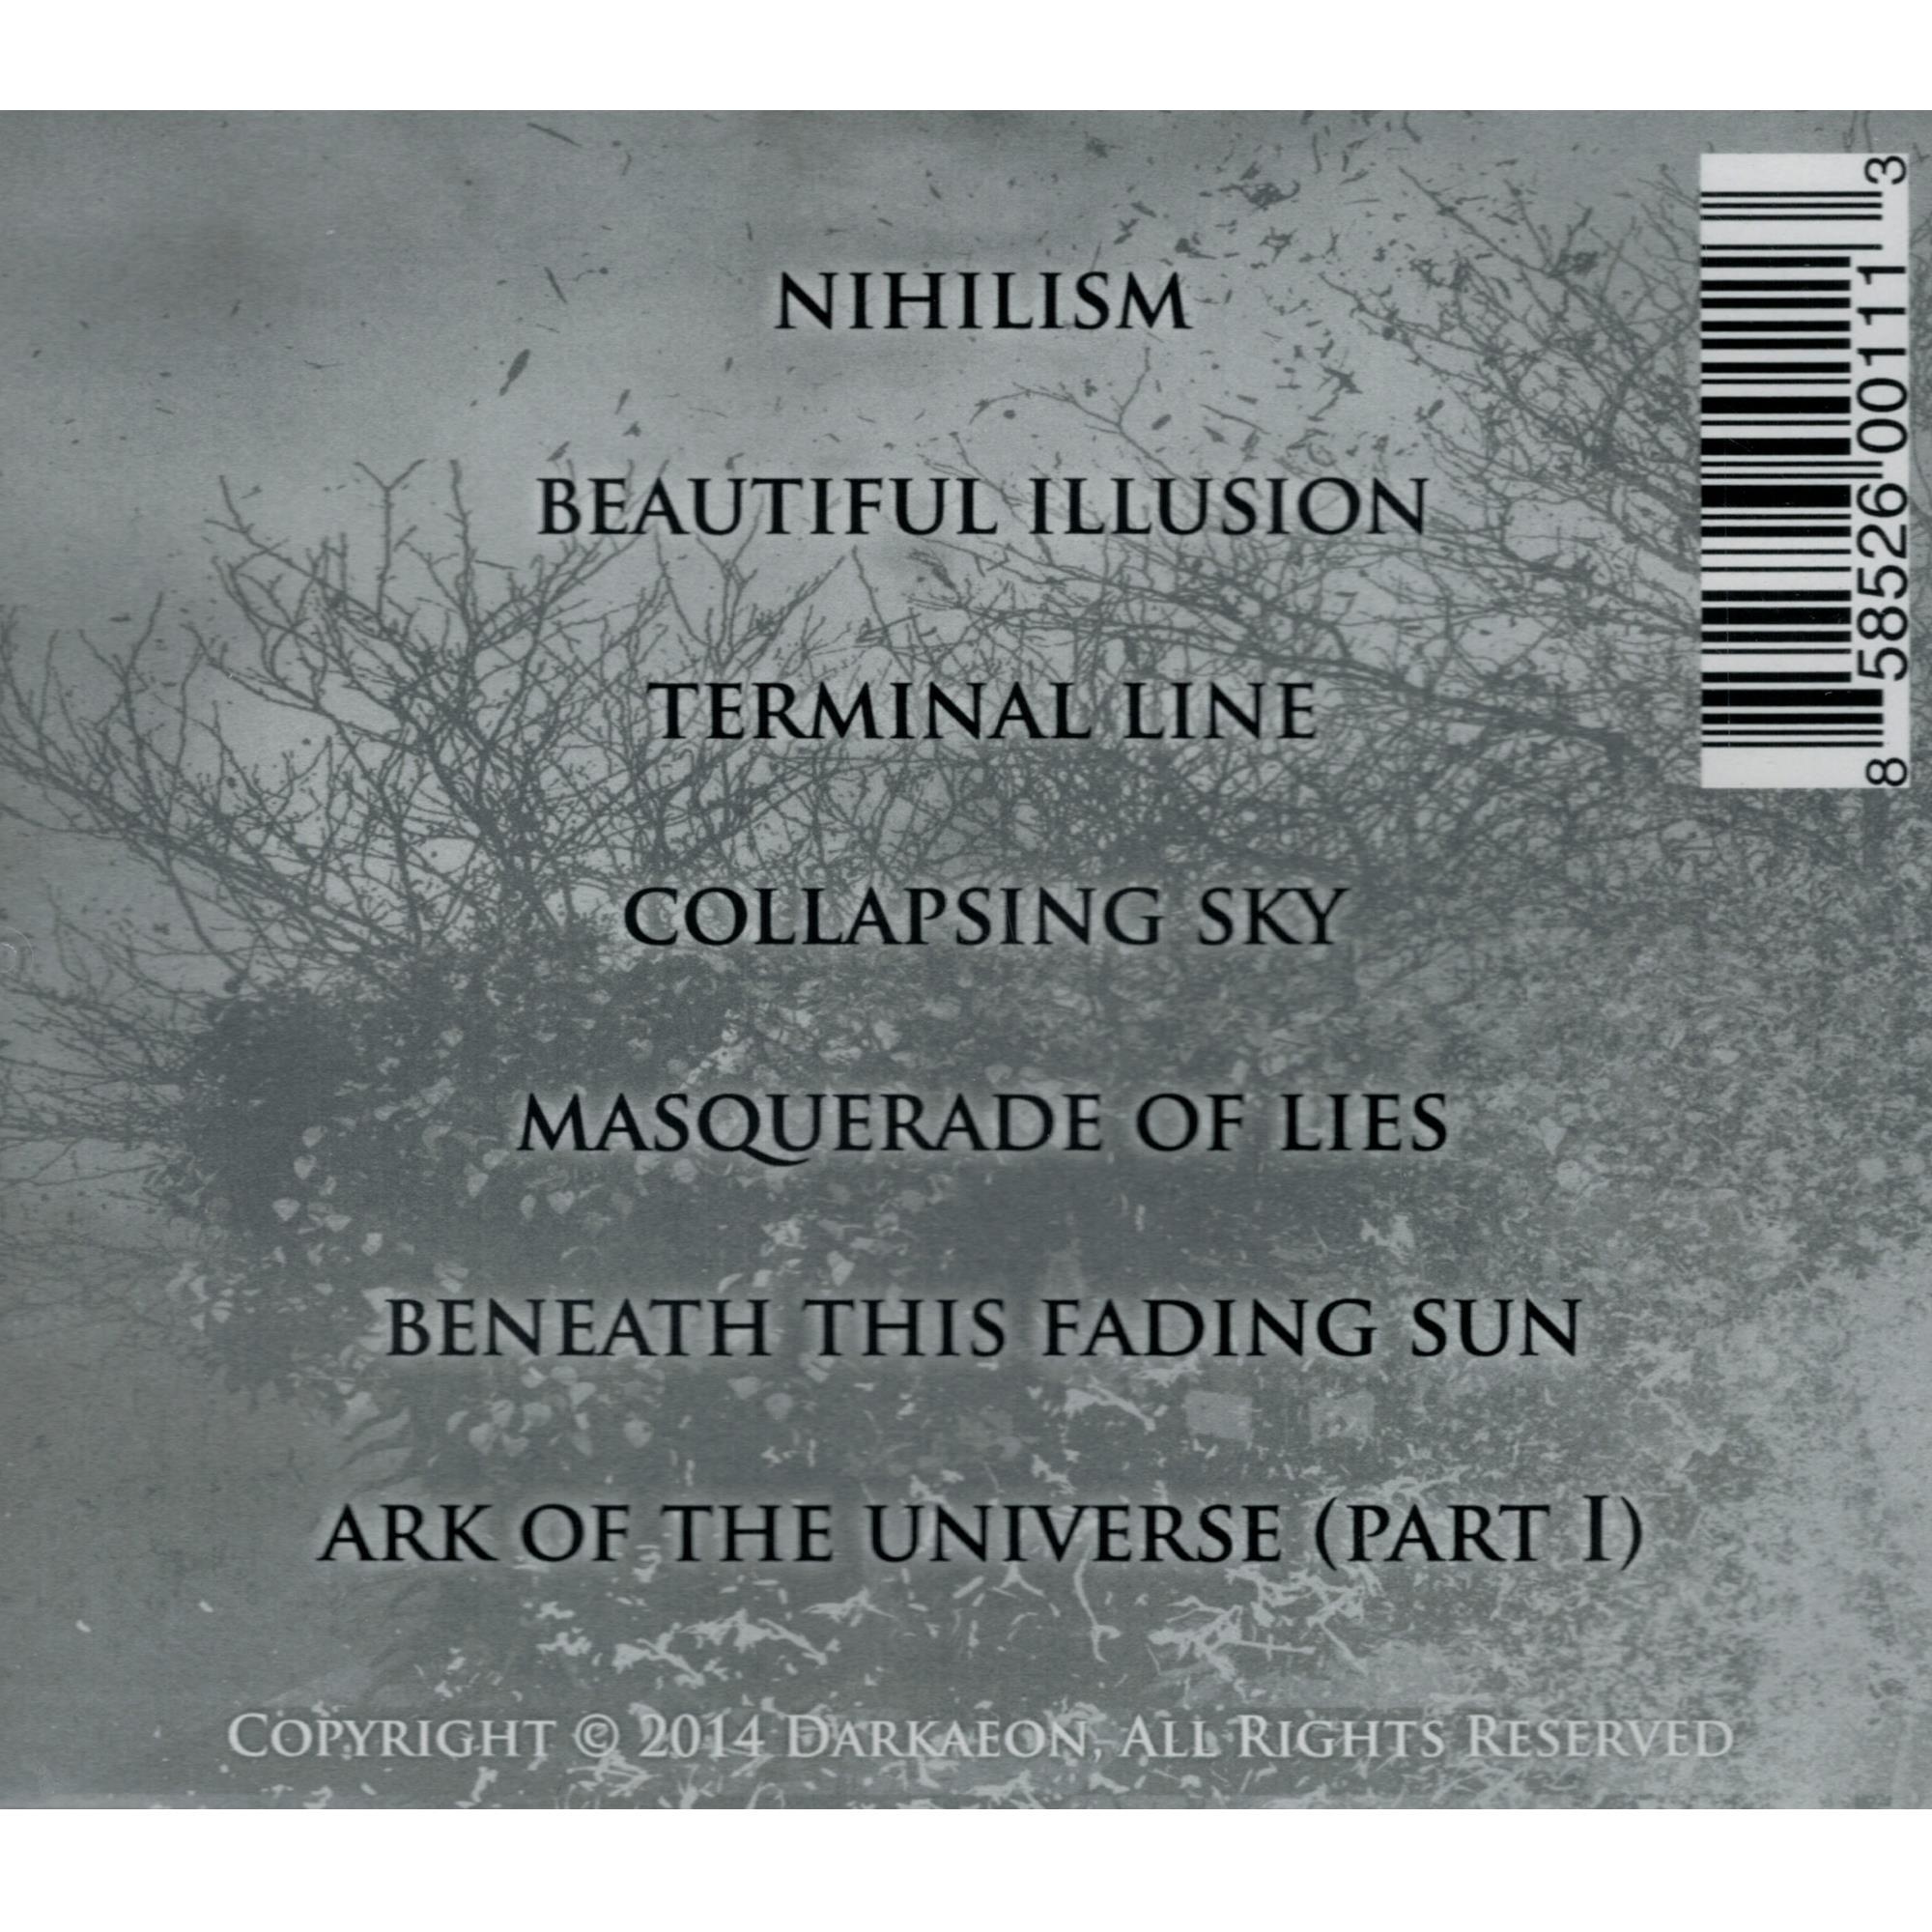 Nihilism CD